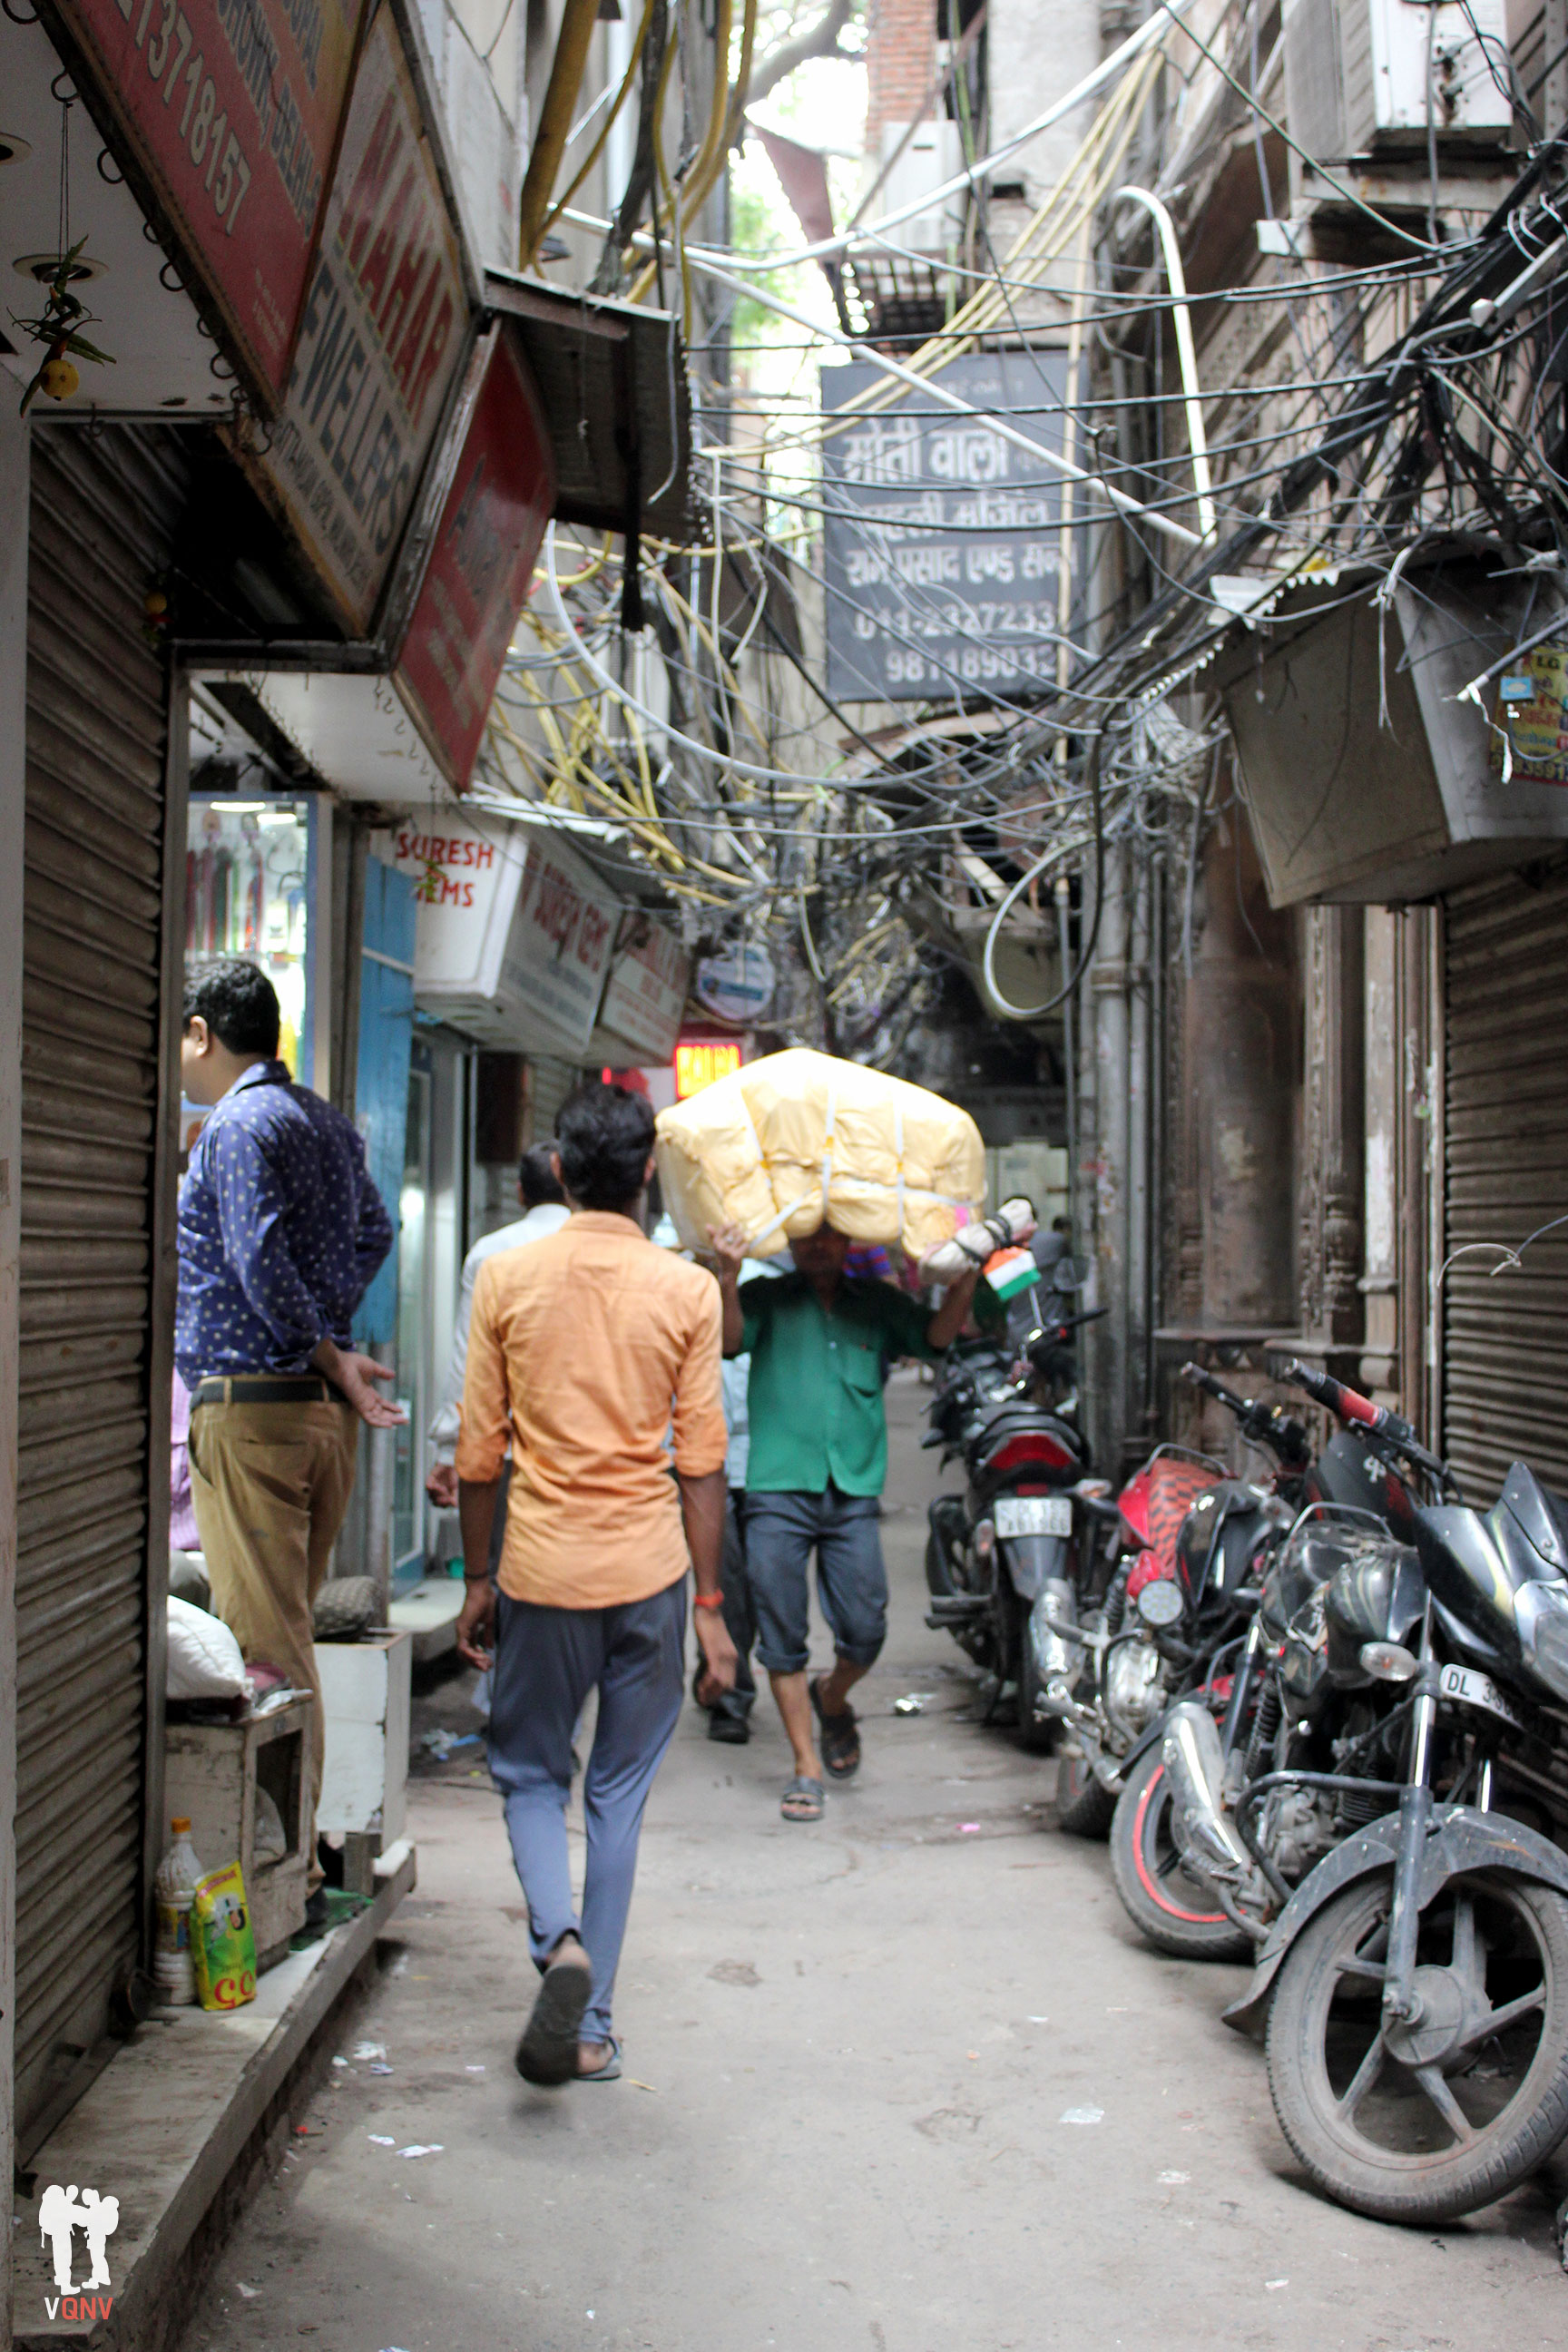 Calle tranquila en Chandni Chowk